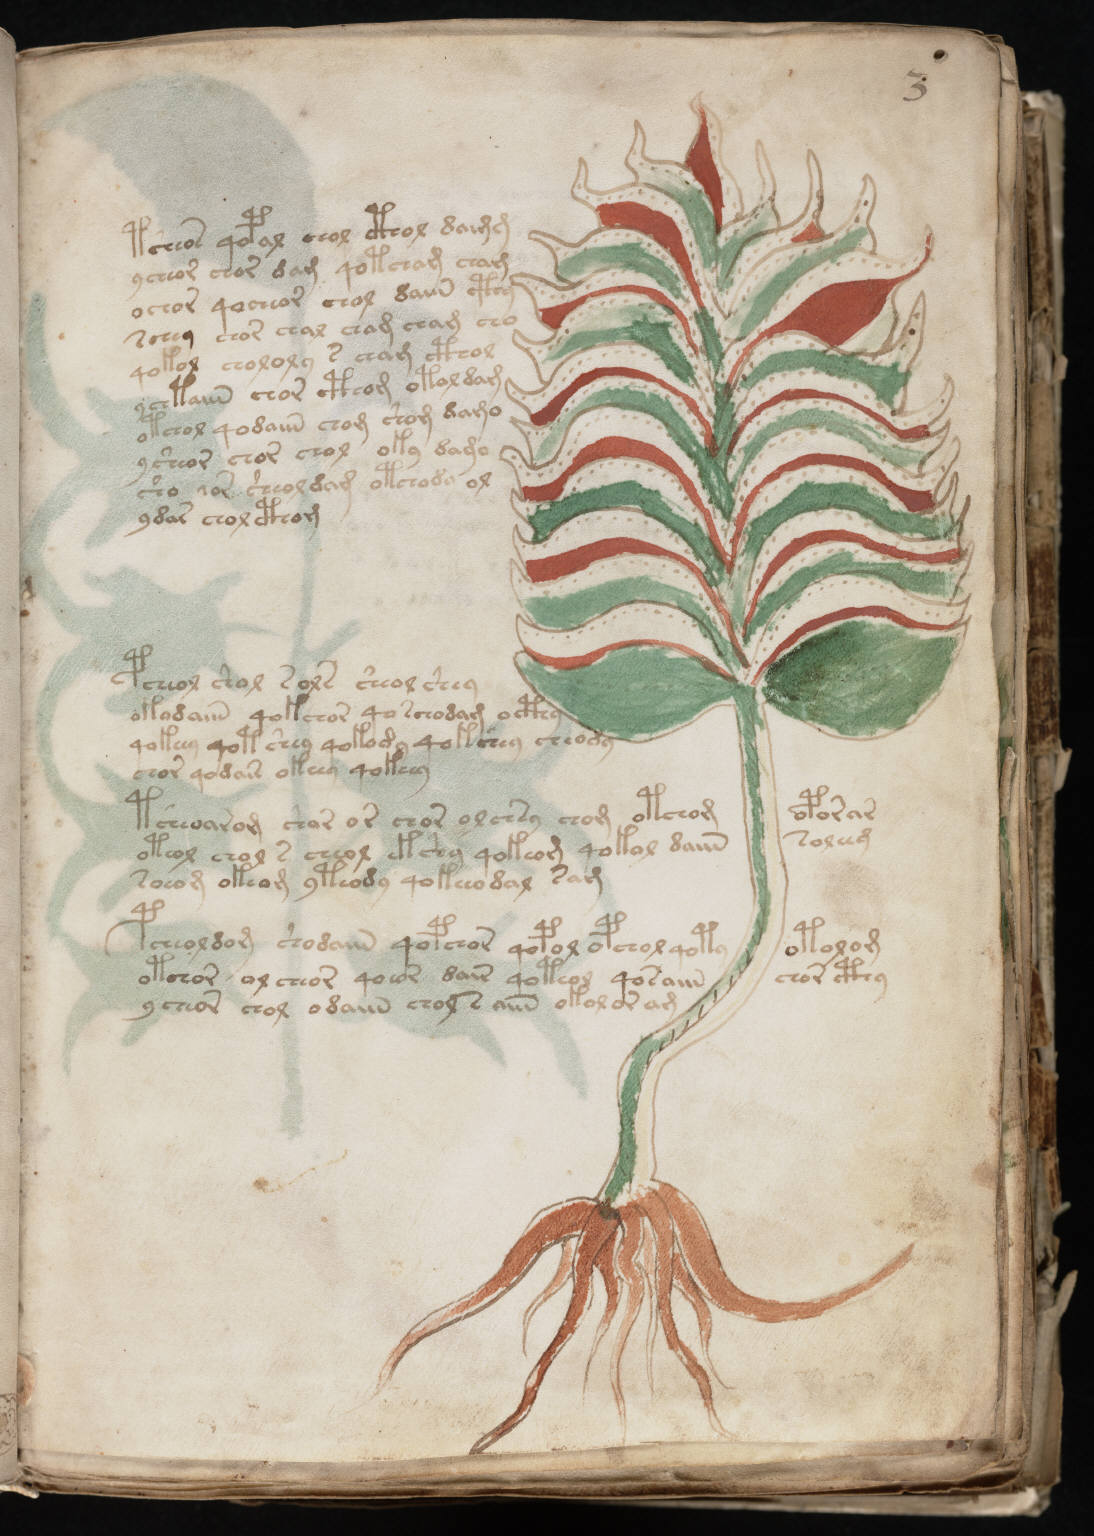 Voynich Manuscript %287%29 ヴォイニッチ手稿(写本) どの言語にも属さない謎の文字!